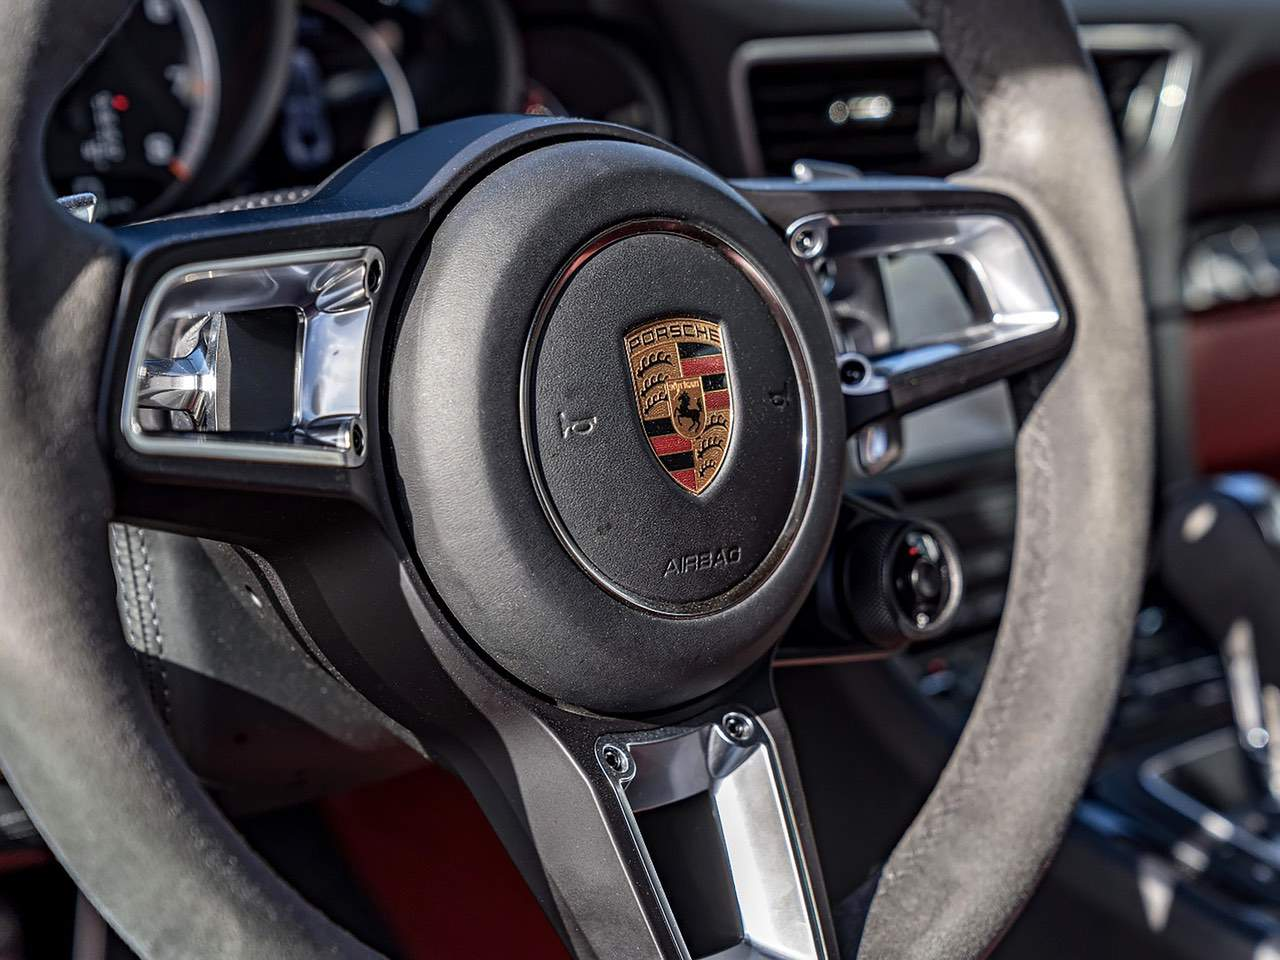 Porsche-911-Turbo-S-9